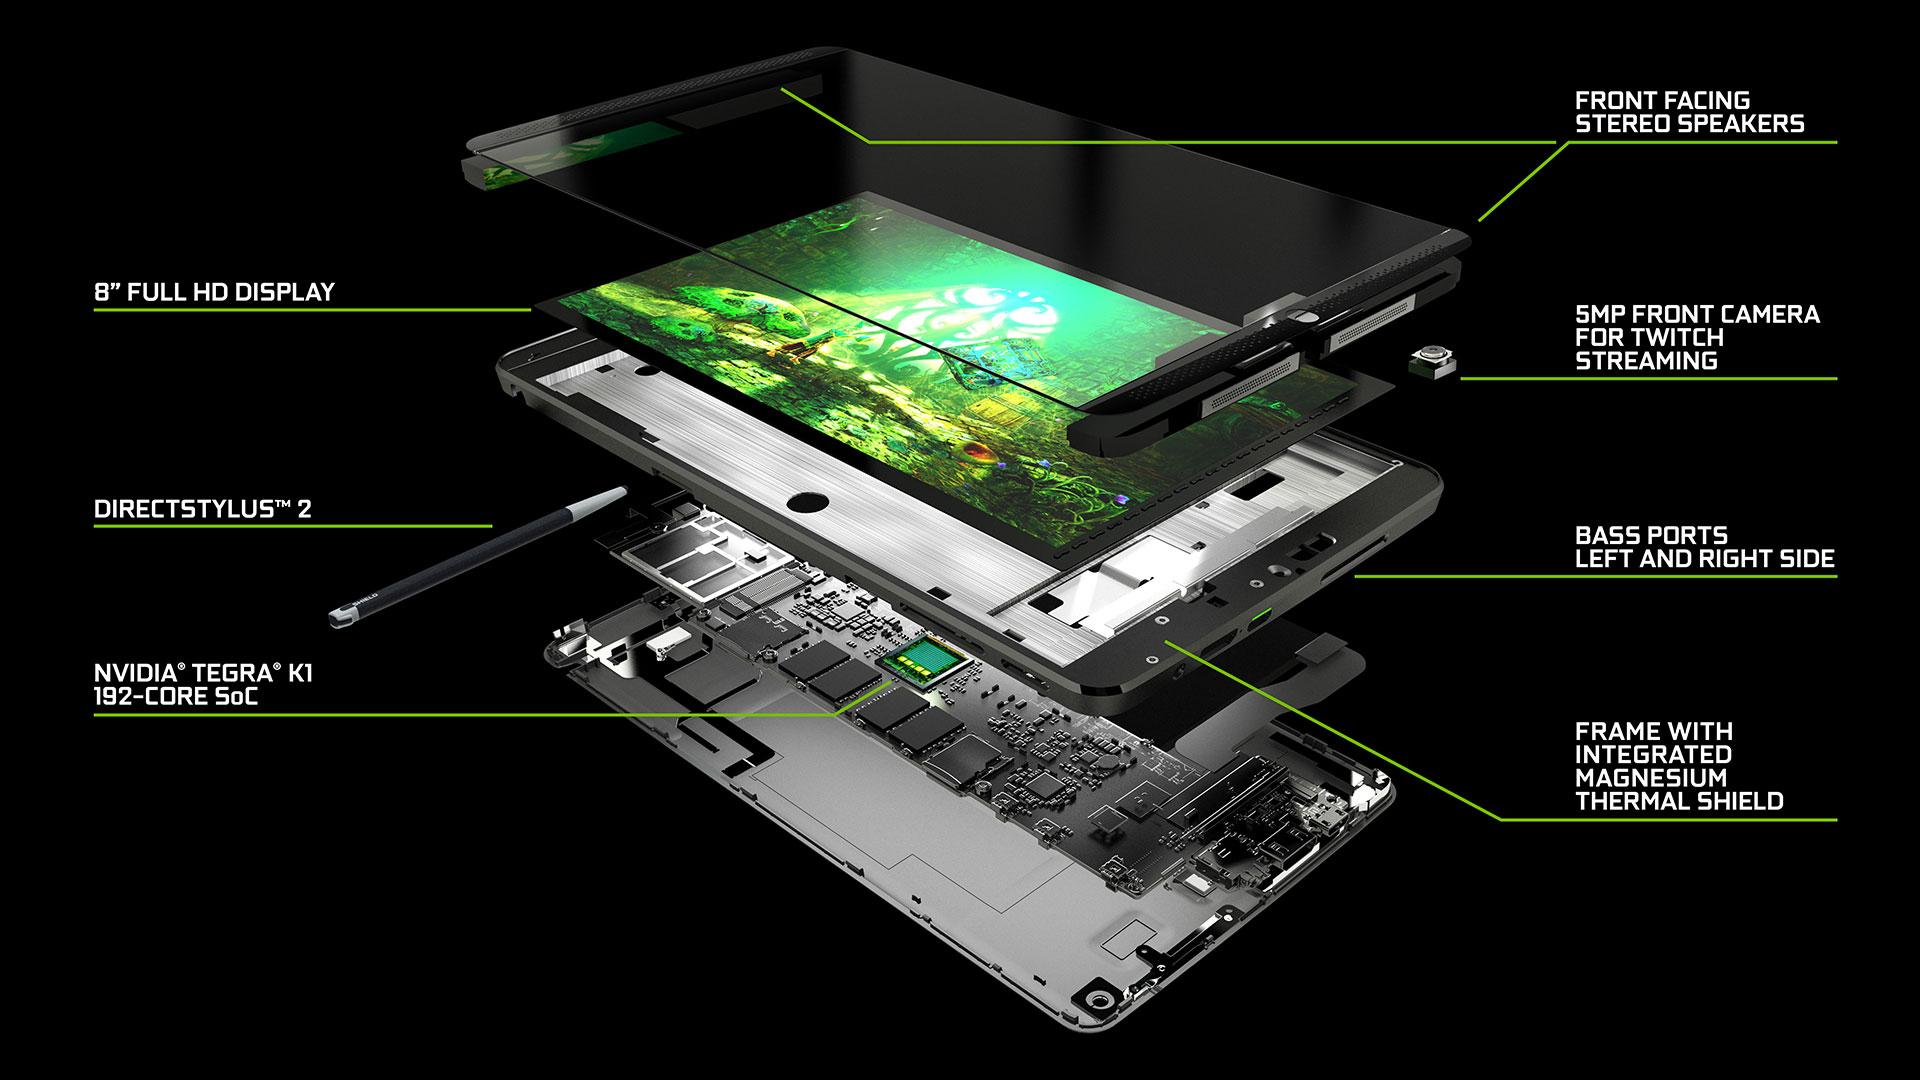 shield-tablet-exploded-view-black-bckgr.jpg